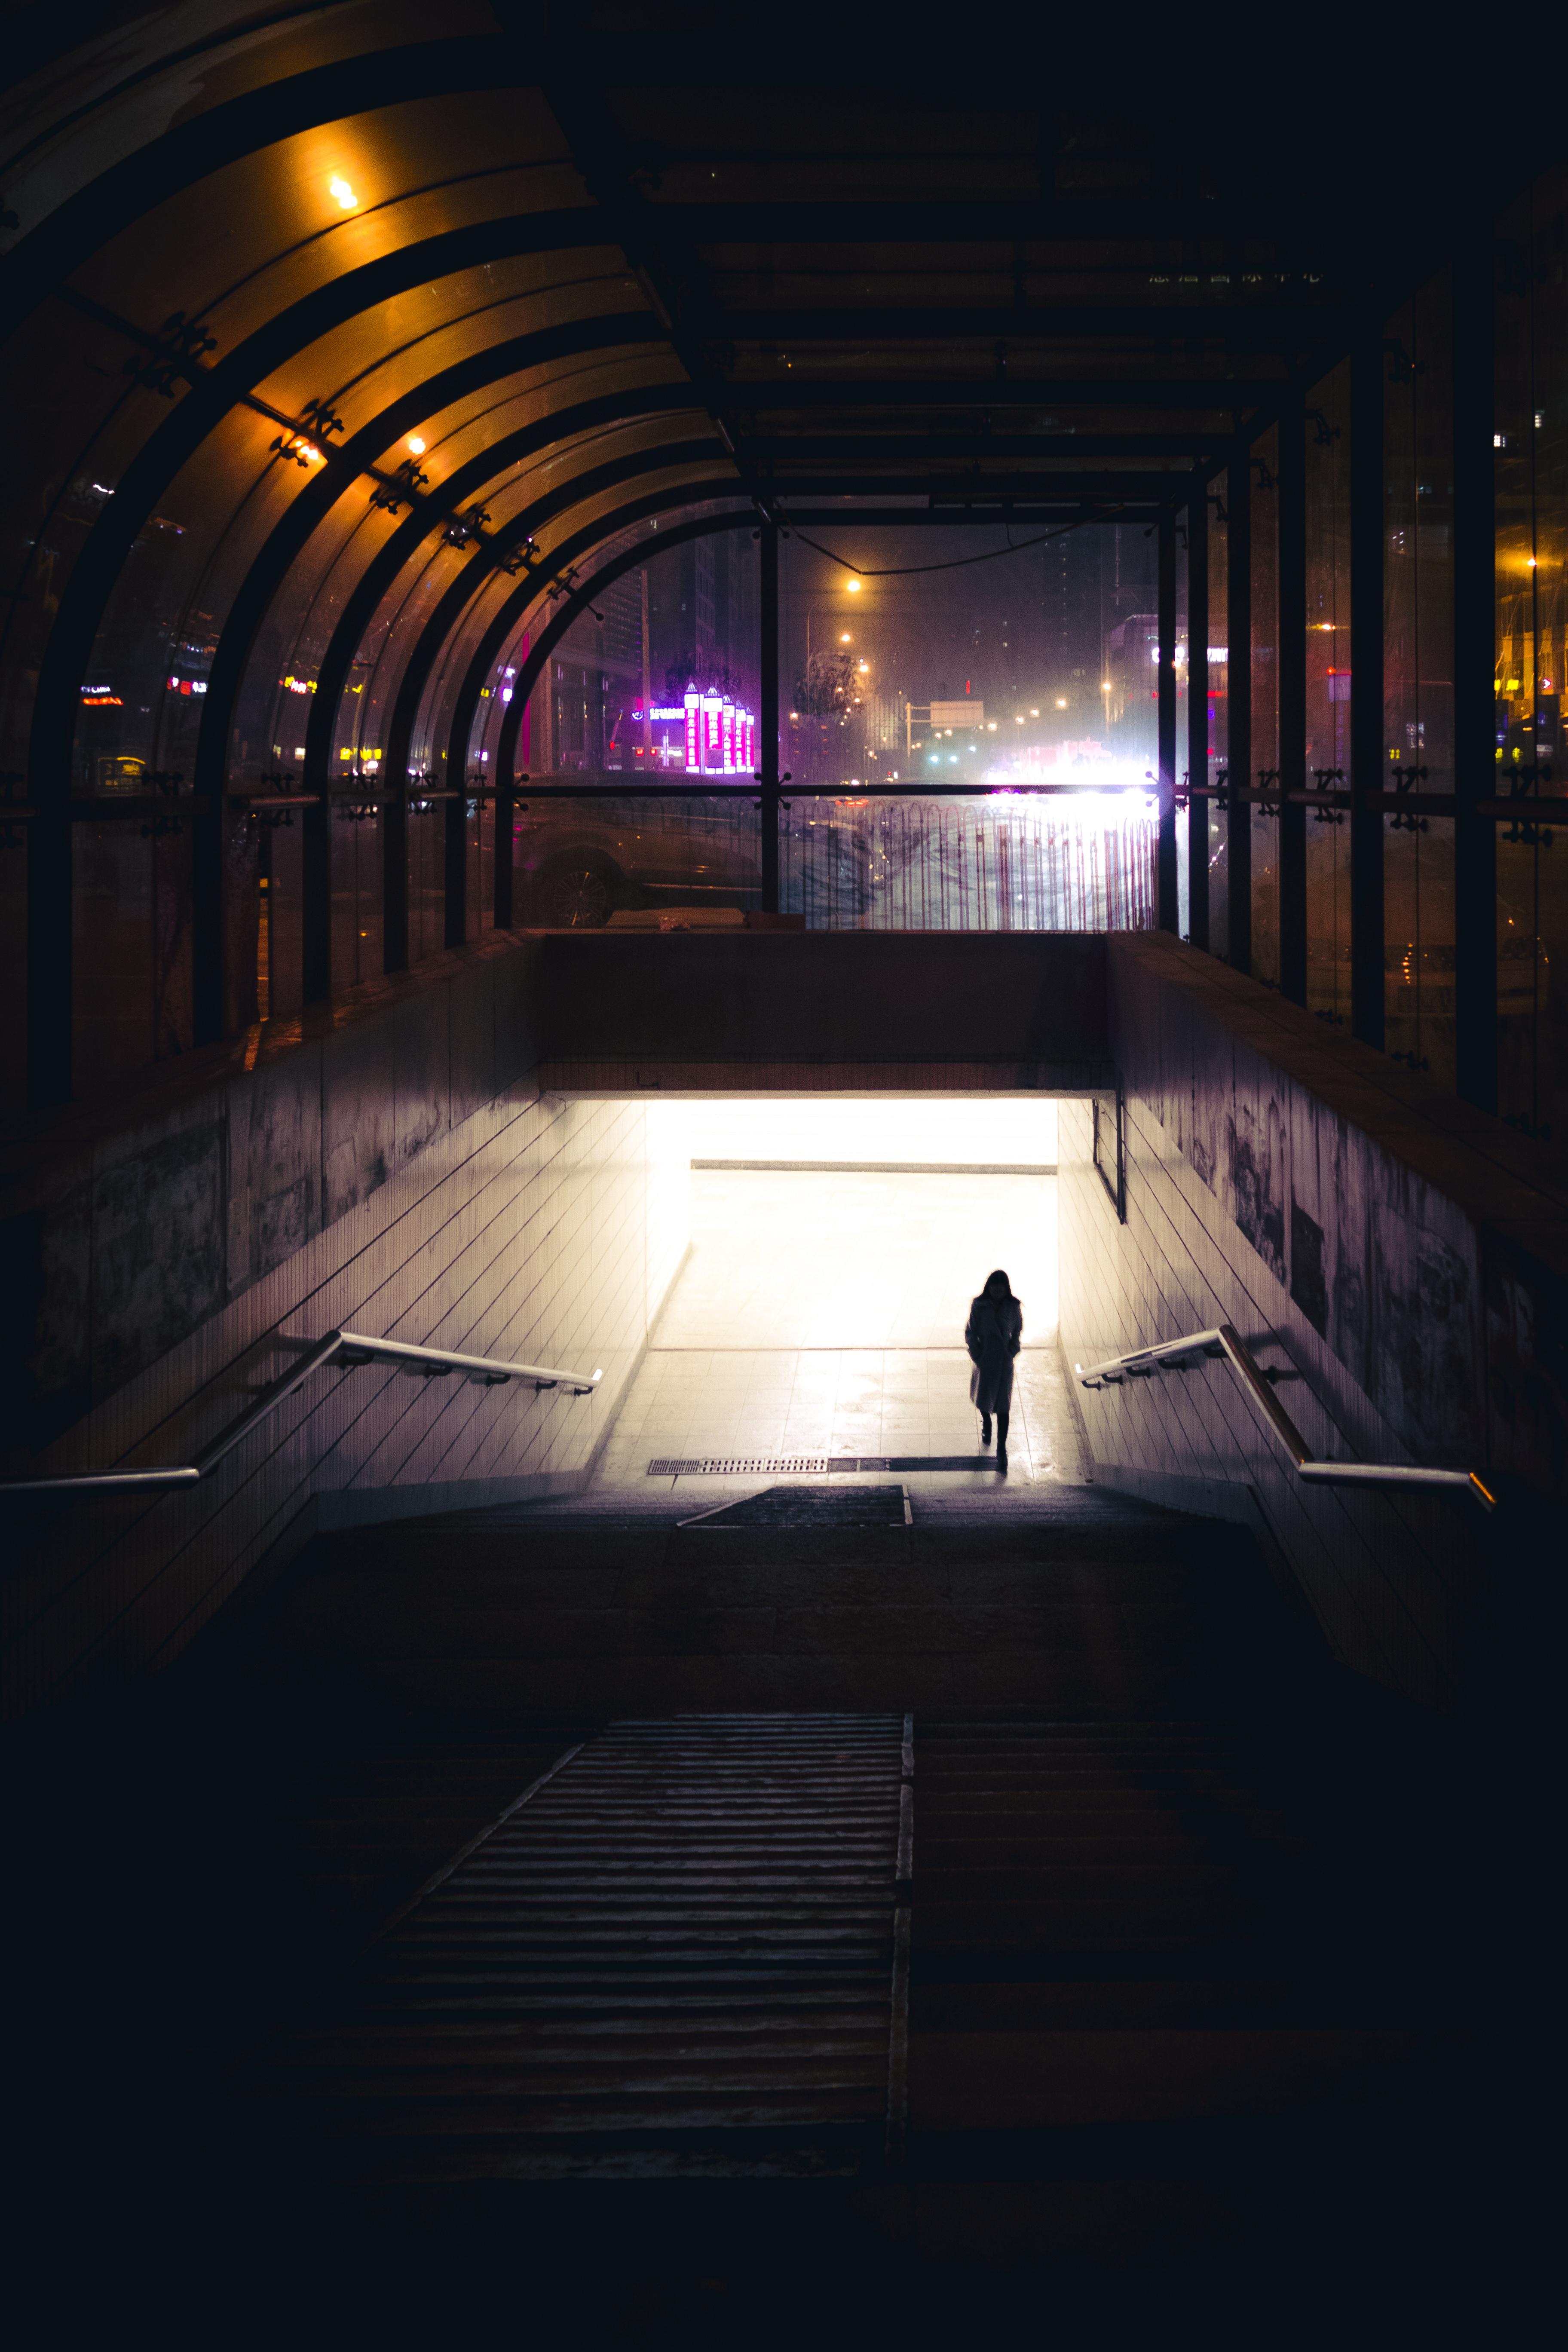 Free Images  silhouette light street night camera photography city urban underground chinese reflection human darkness lighting world ... & Free Images : silhouette light street night camera photography ...